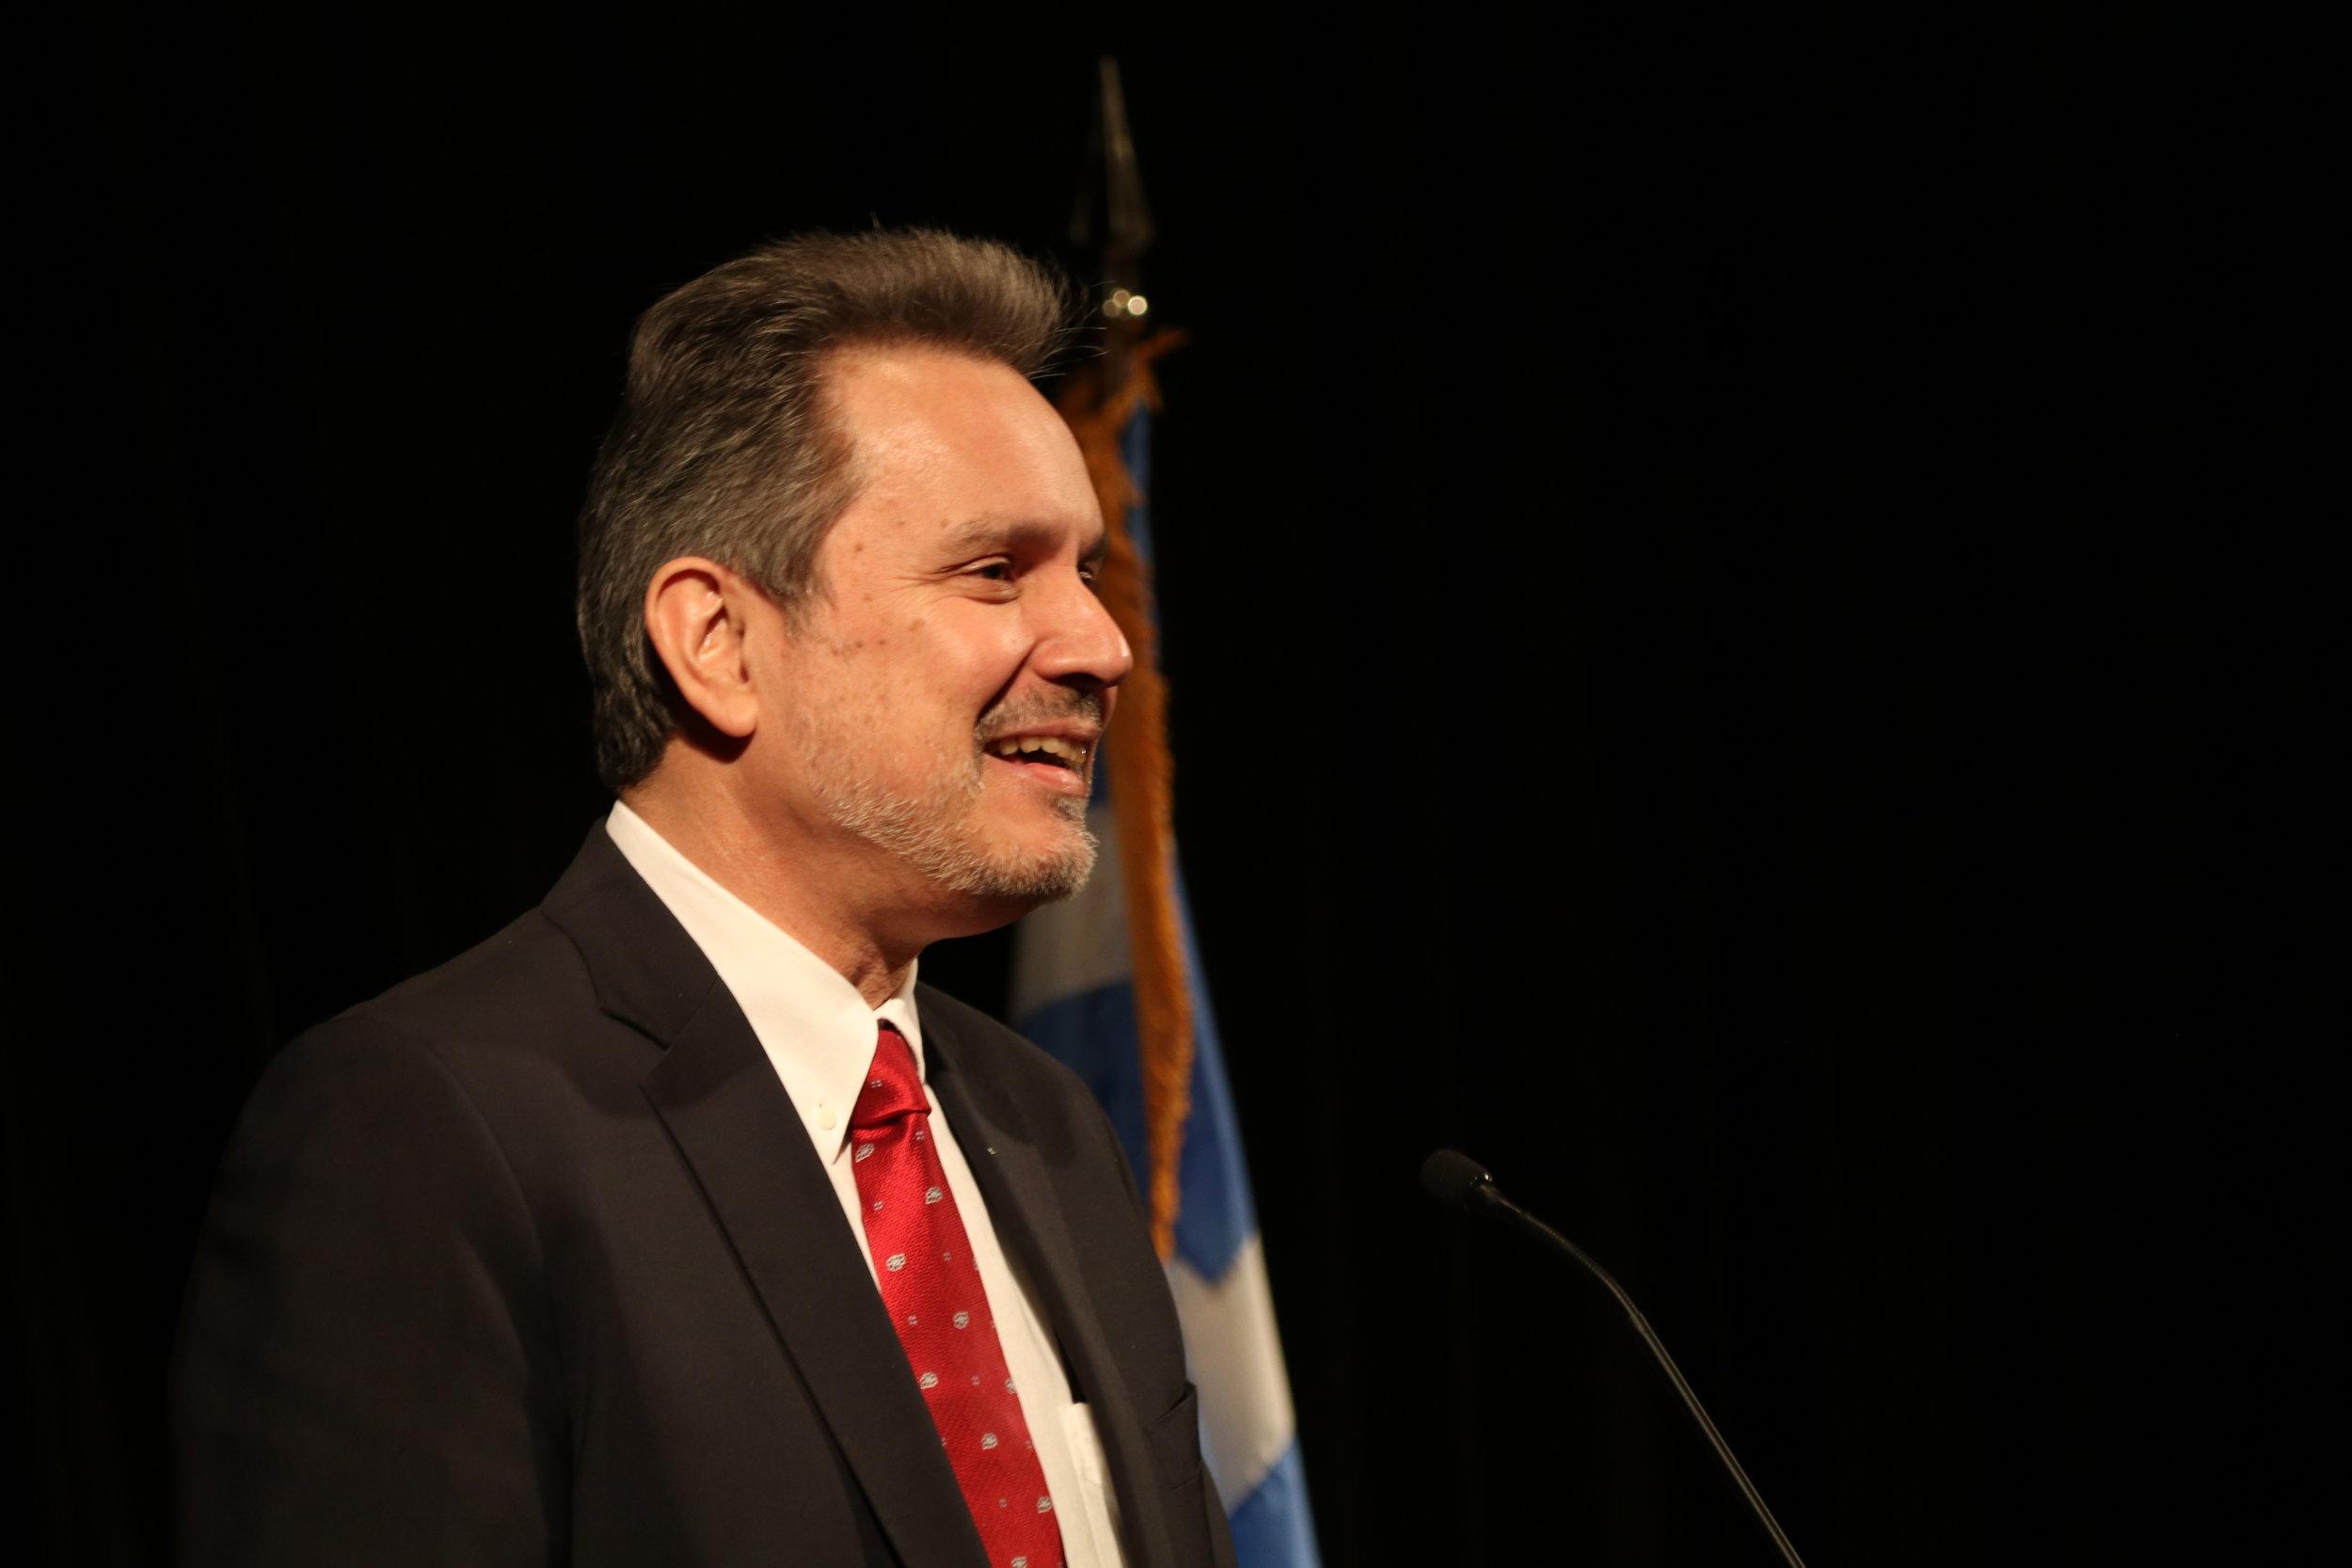 Ambassador Haris Lalacos, Greek Ambassador to the United States, provides the Keynote address.